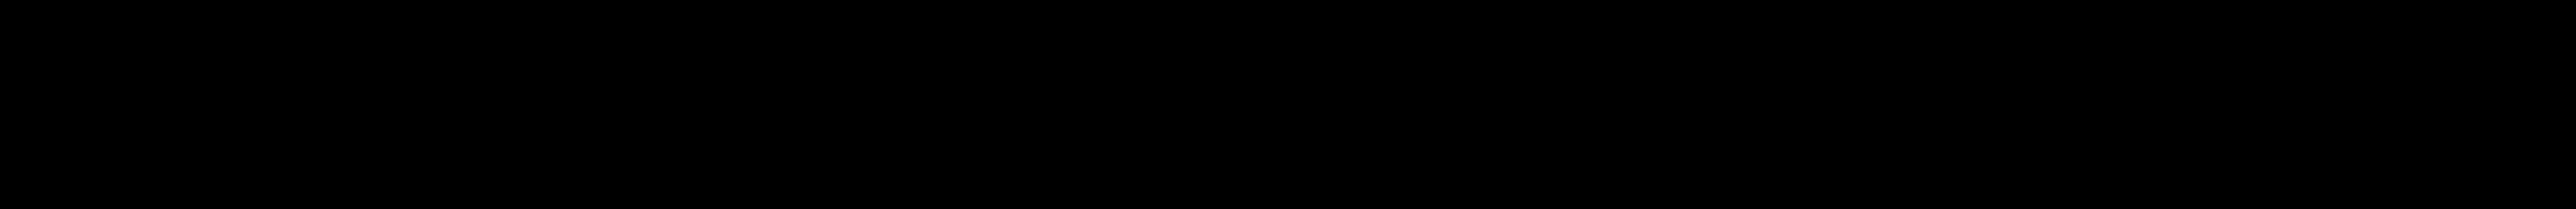 Geom Graphic Regular Italic